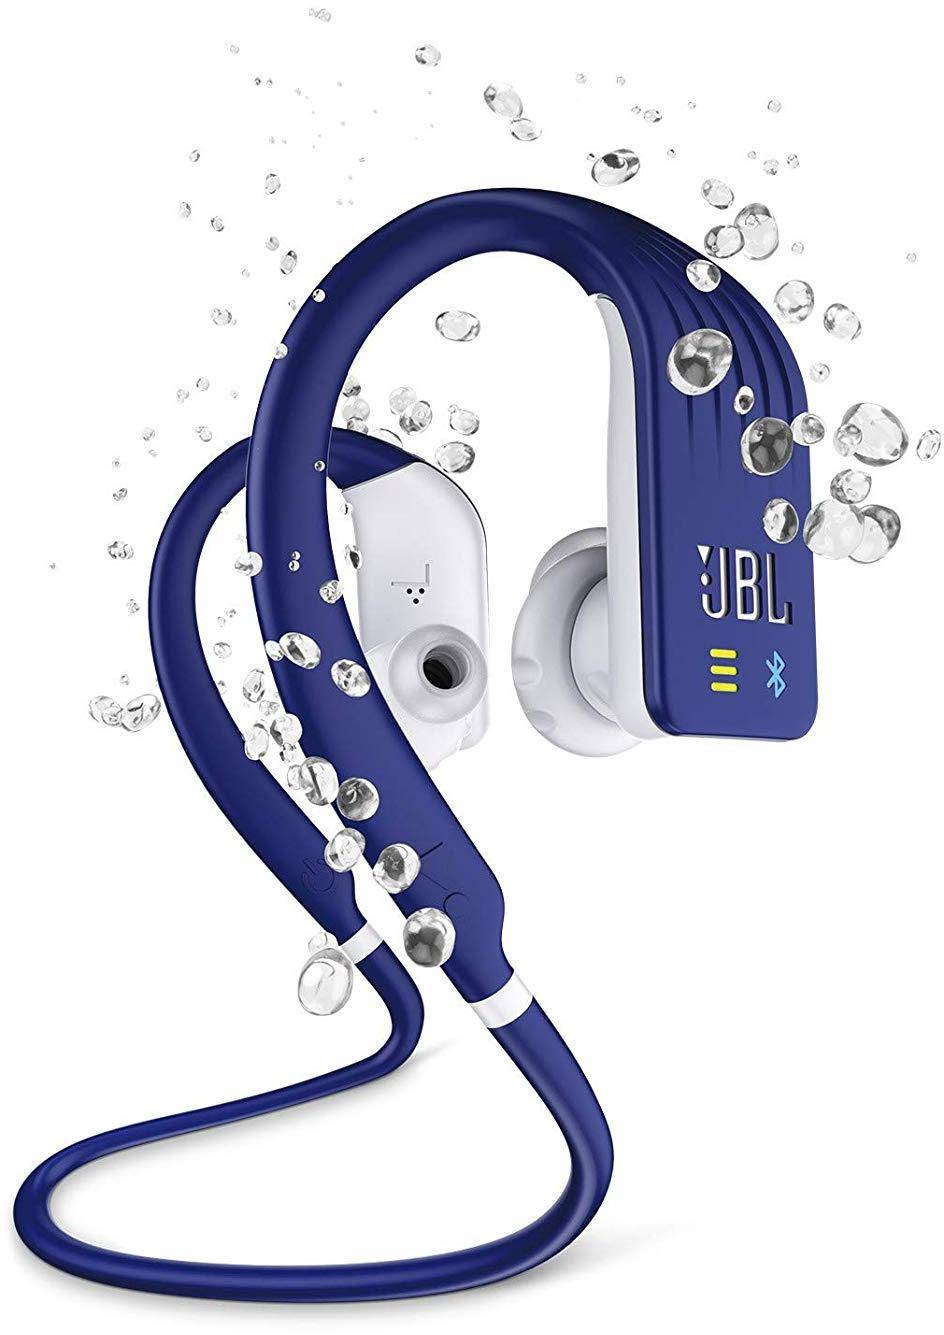 JBL Endurance Dive Waterproof In-Ear Sport Bluetooth Headset zoom image